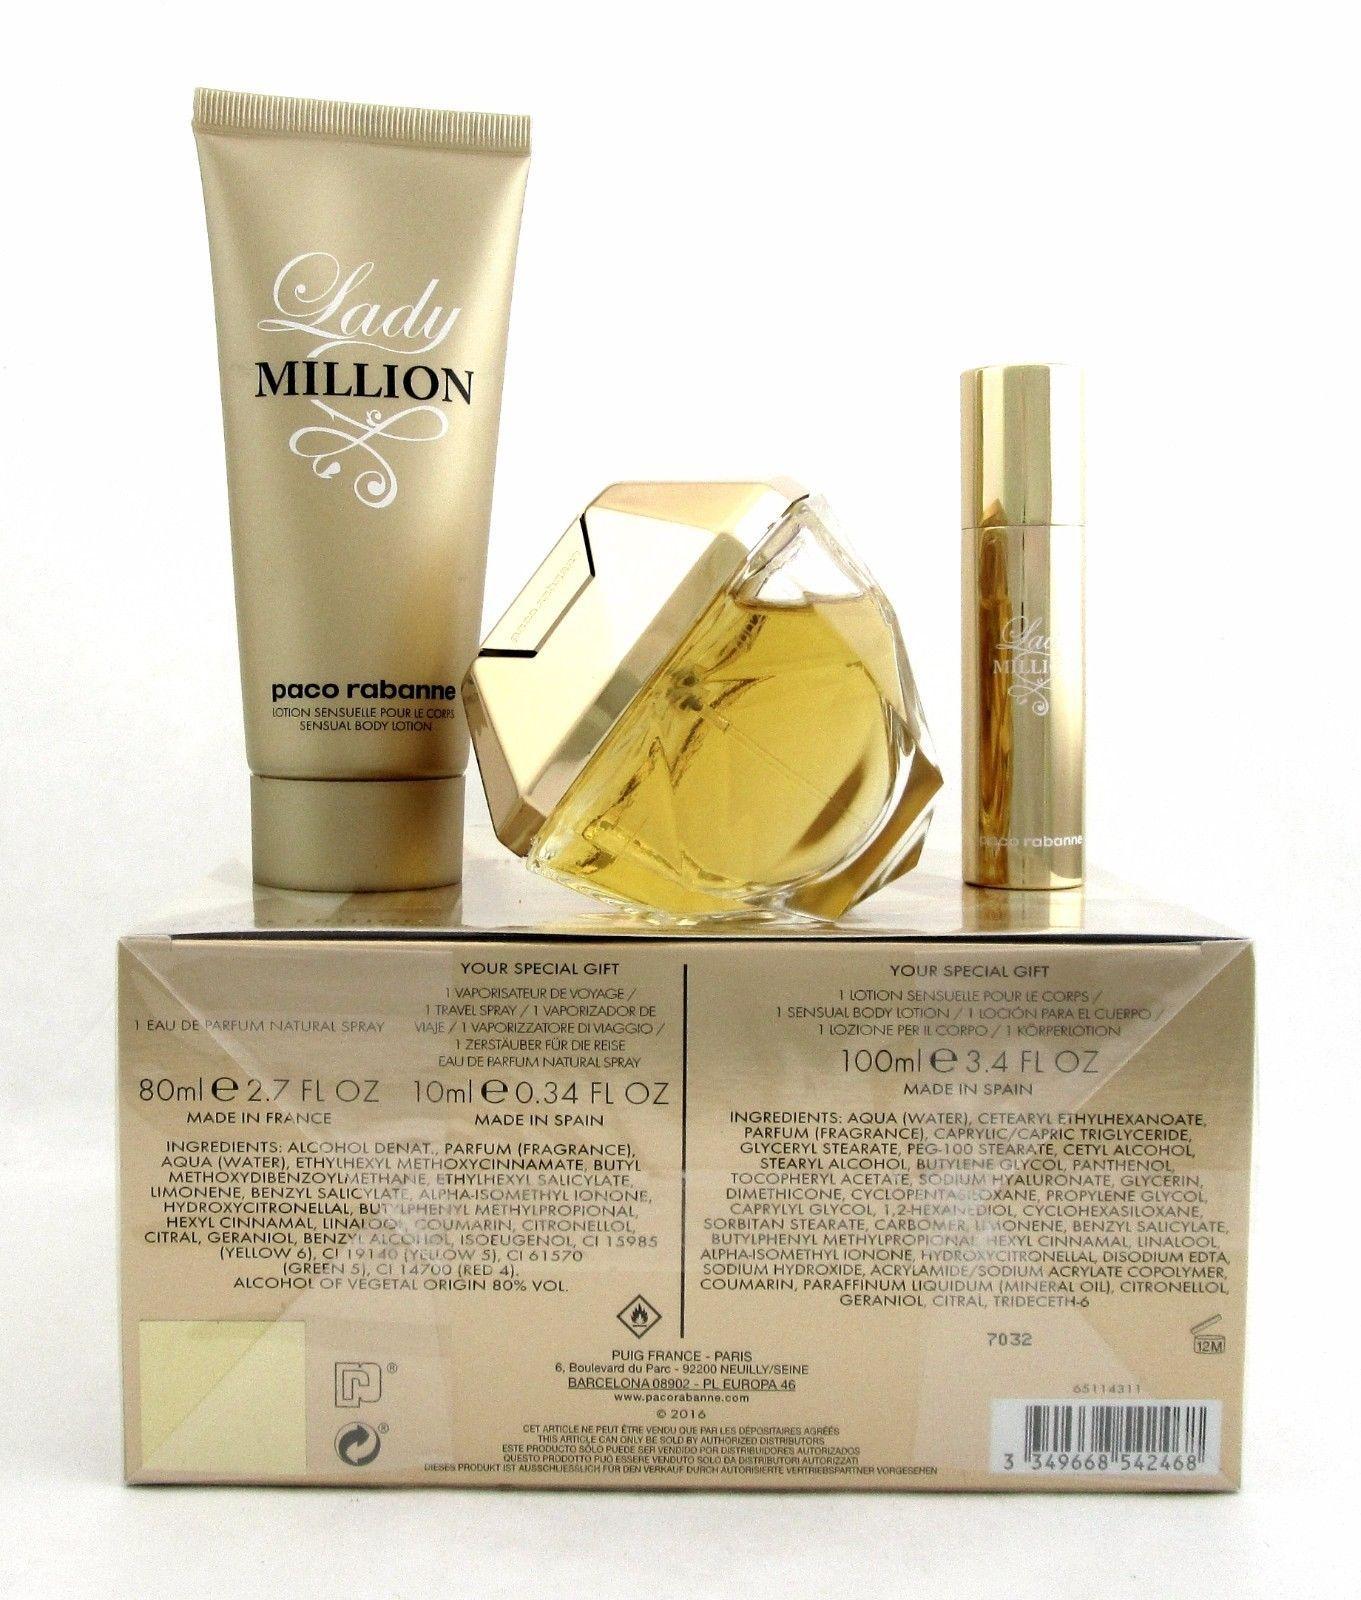 Paco Rabanne Lady Million Set Cosmetic Paco Rabanne Lady Million